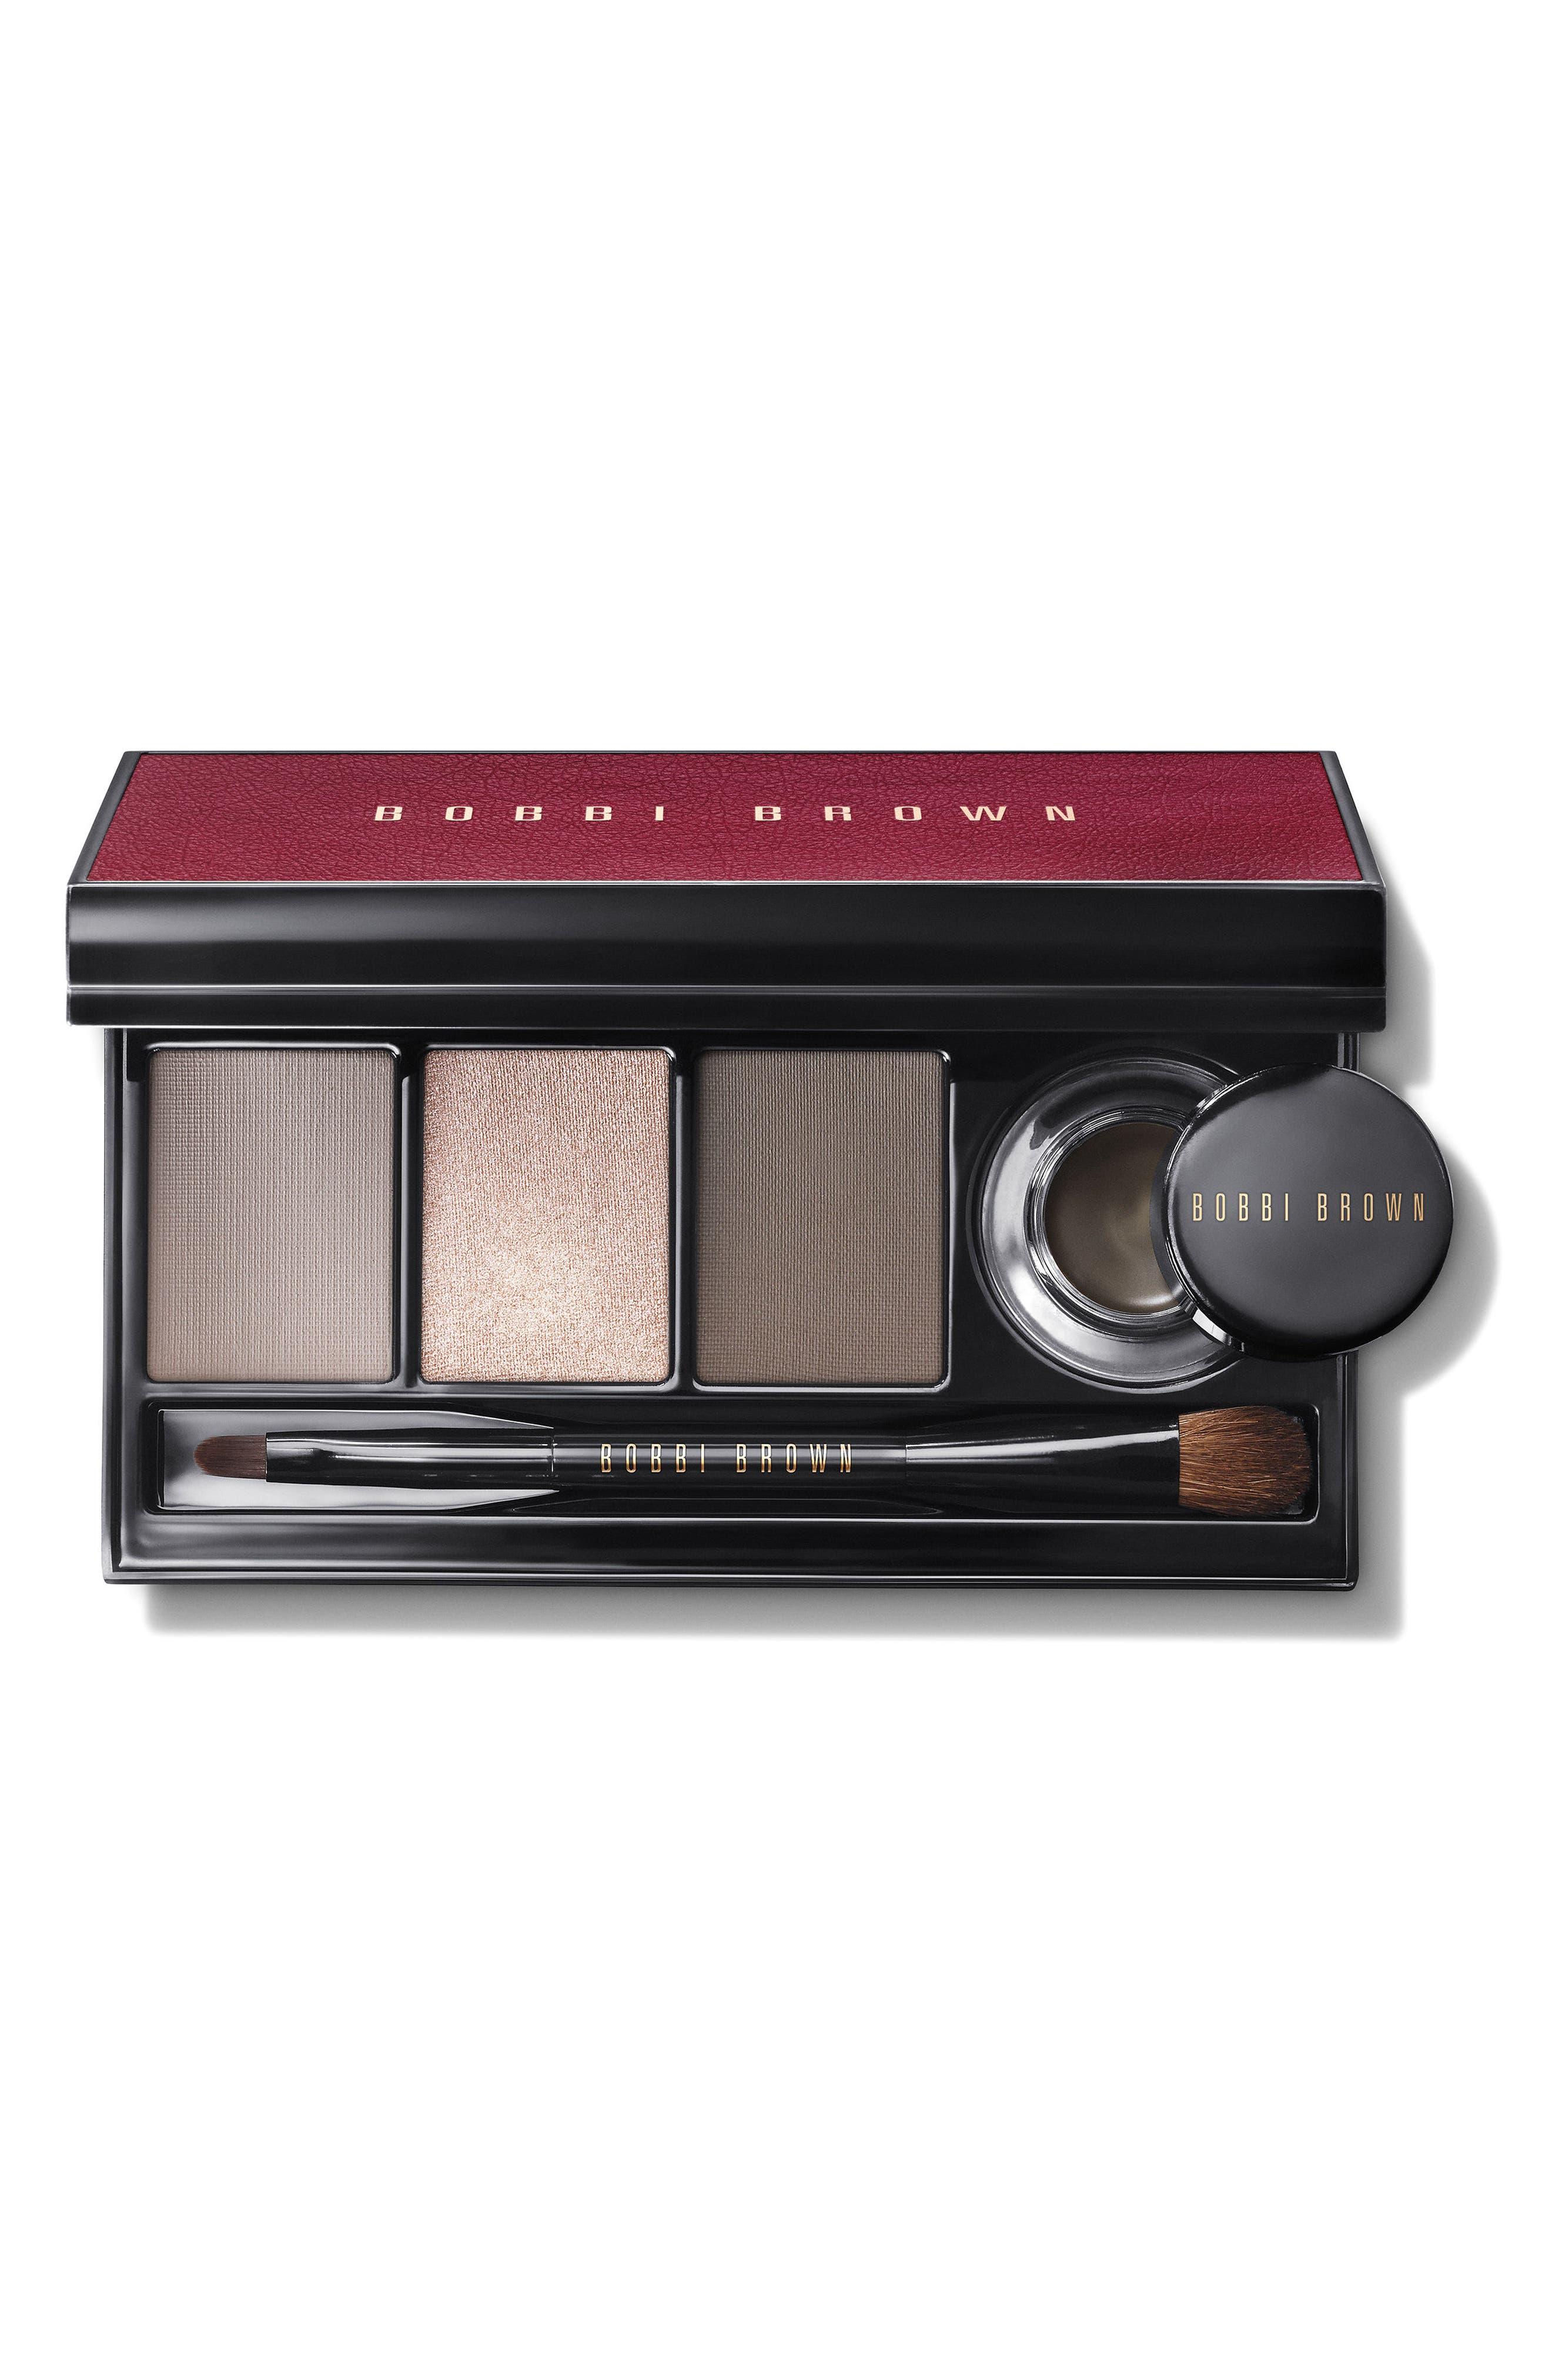 Satin & Caviar Eyeshadow & Long-Wear Gel Eyeliner Palette,                         Main,                         color, No Color